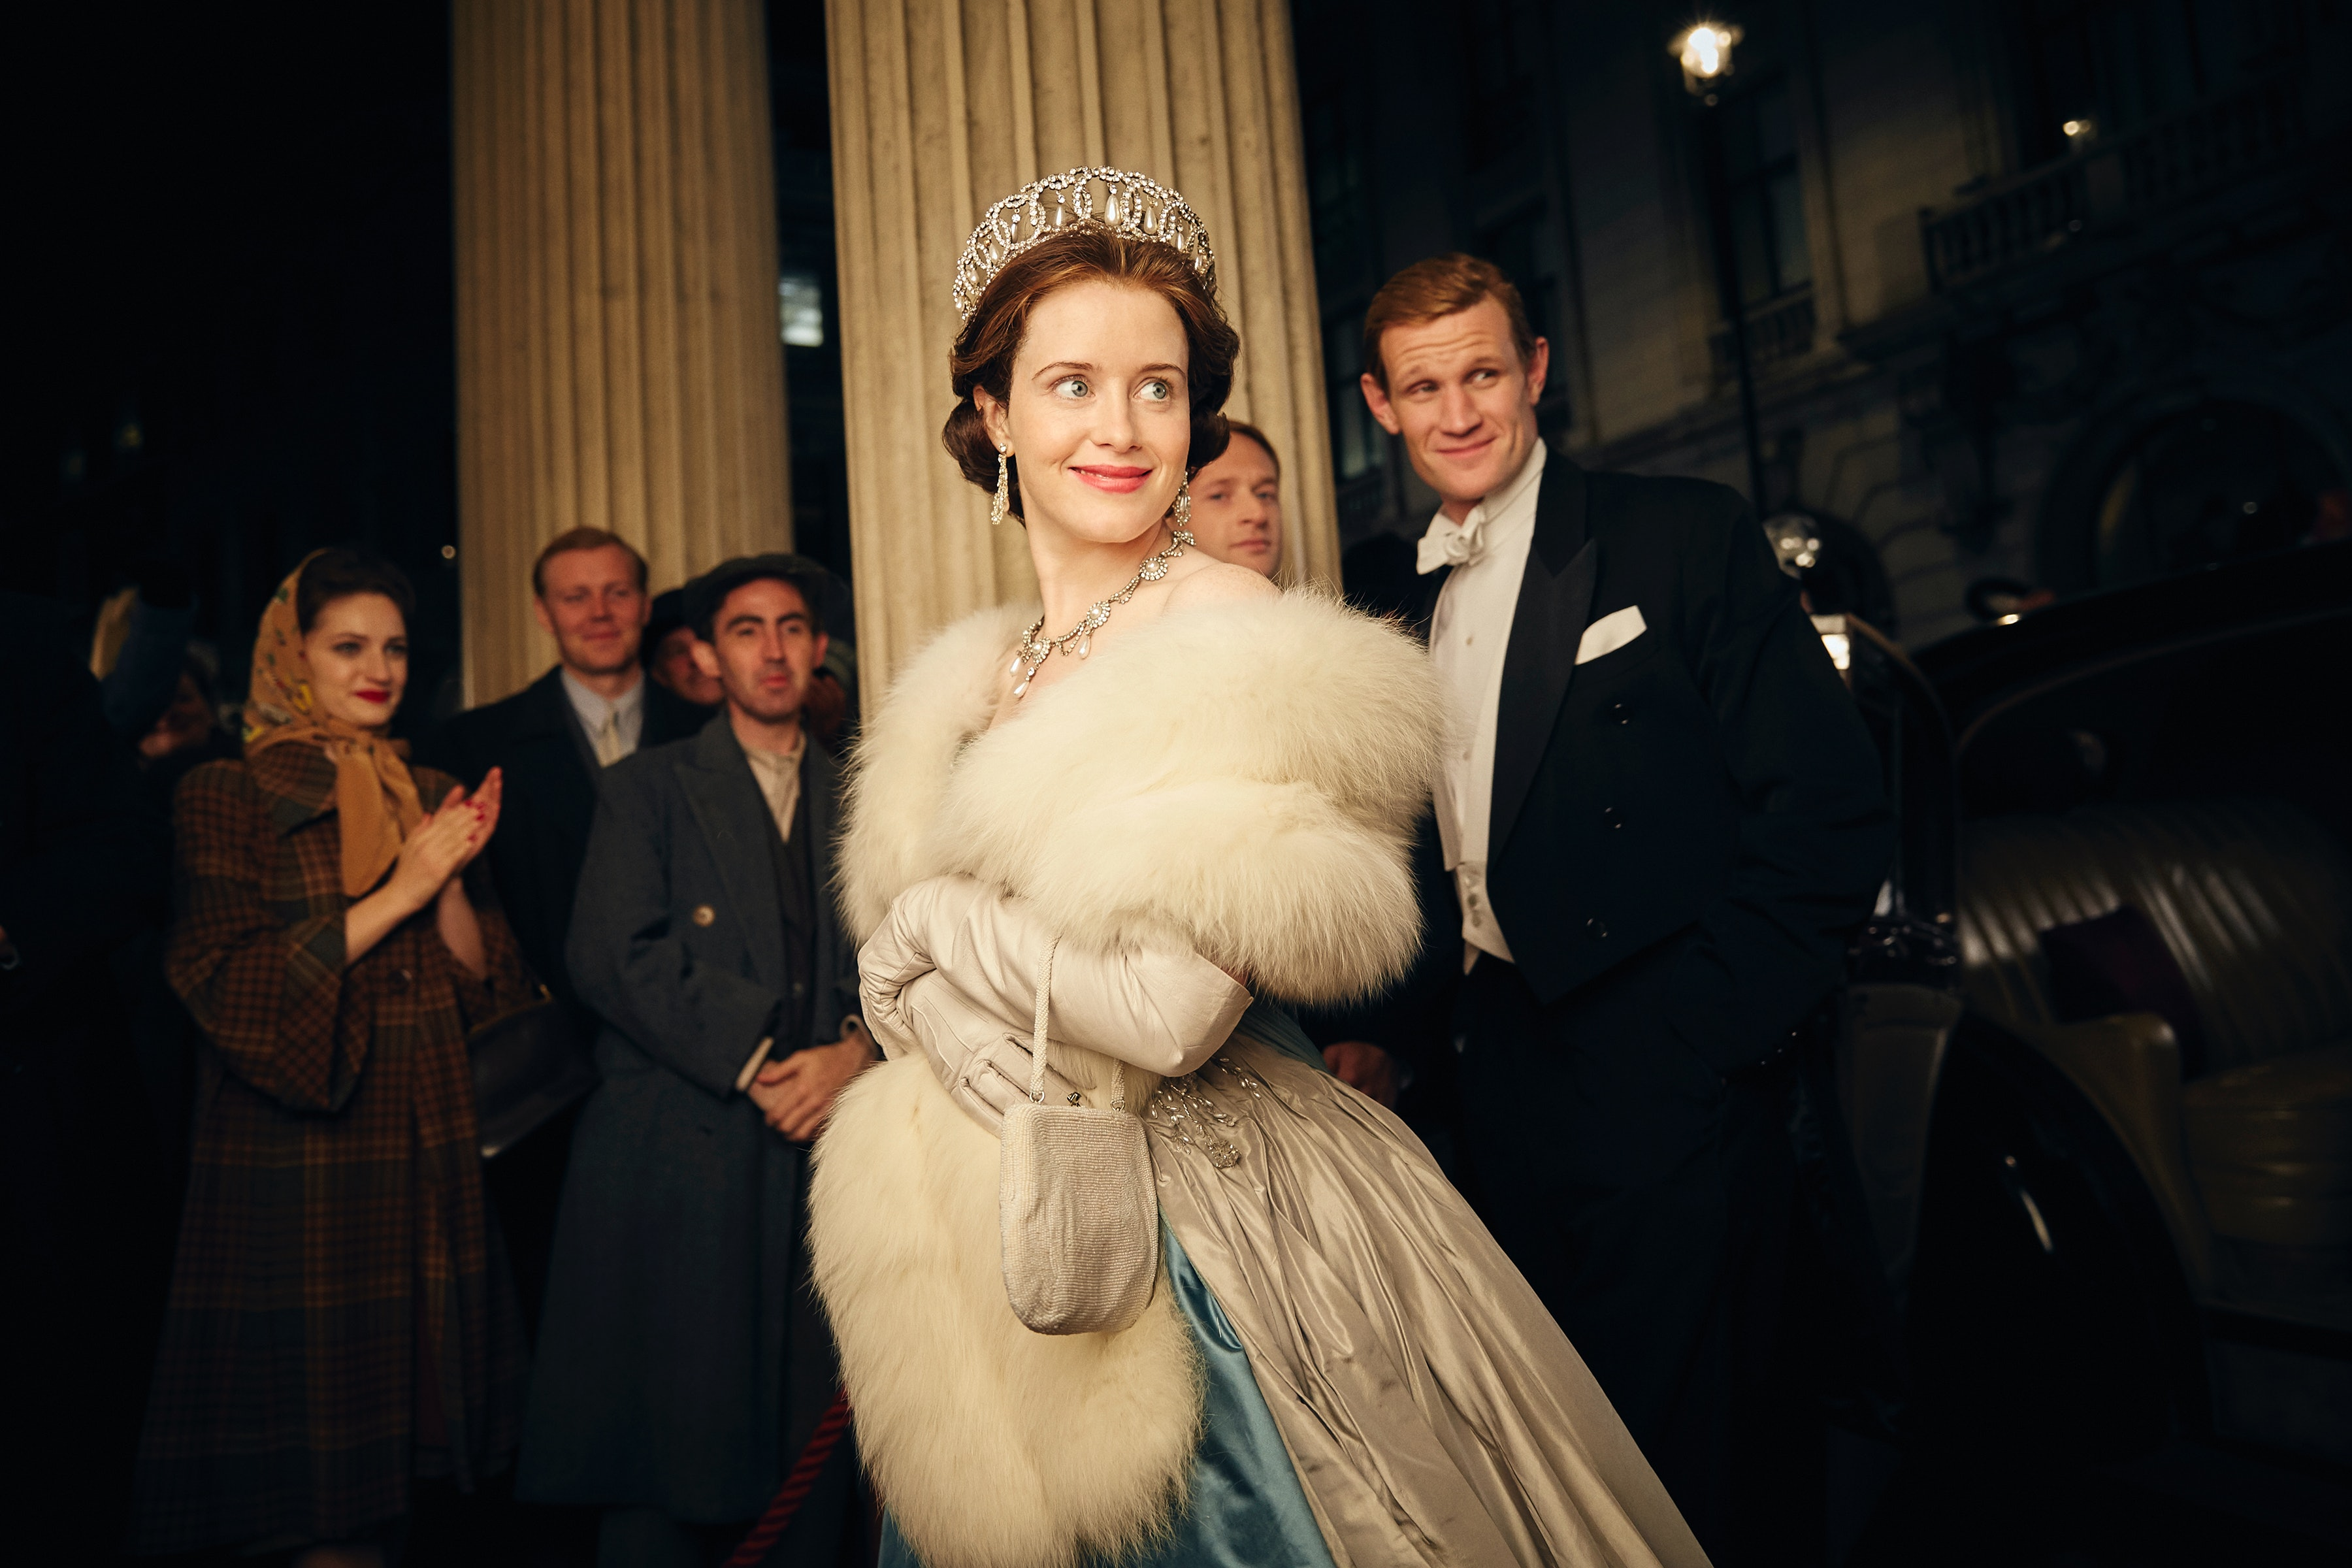 When Does 'The Crown' Season 2 Premiere? Netflix Has A Grand